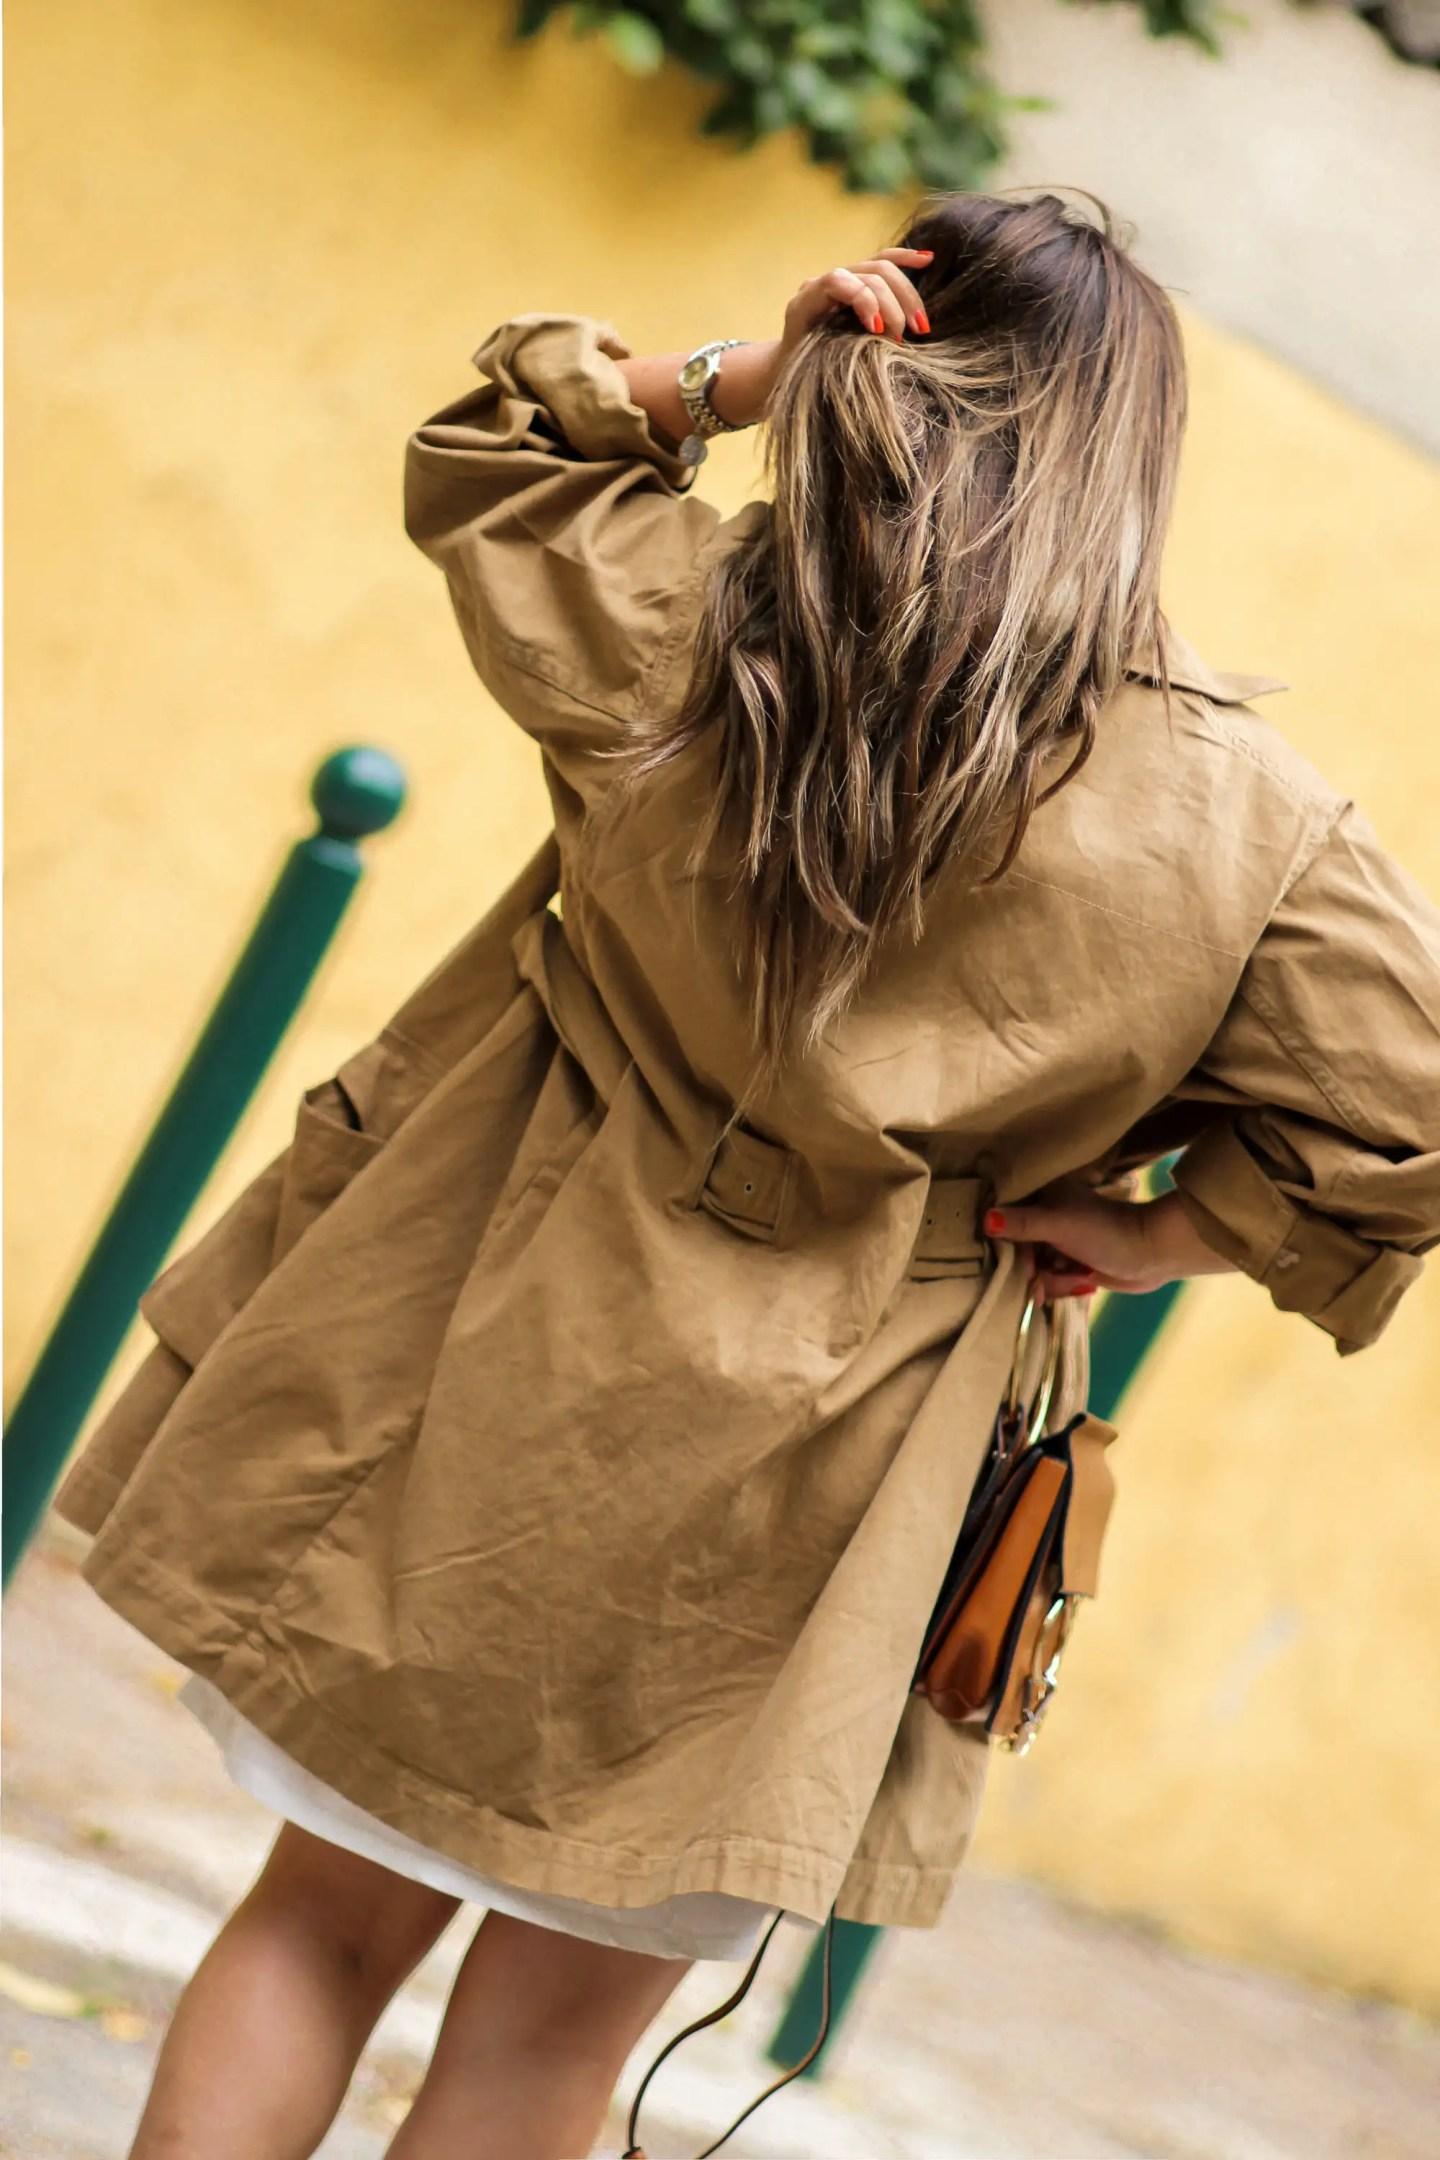 blog mode, the green ananas, hm, trench, tendance safari, hm studio, zara, pull and bear, TENDANCE SAFARI : Ce look que je pourrais porter tous les jours, tendance safari chic, rolex